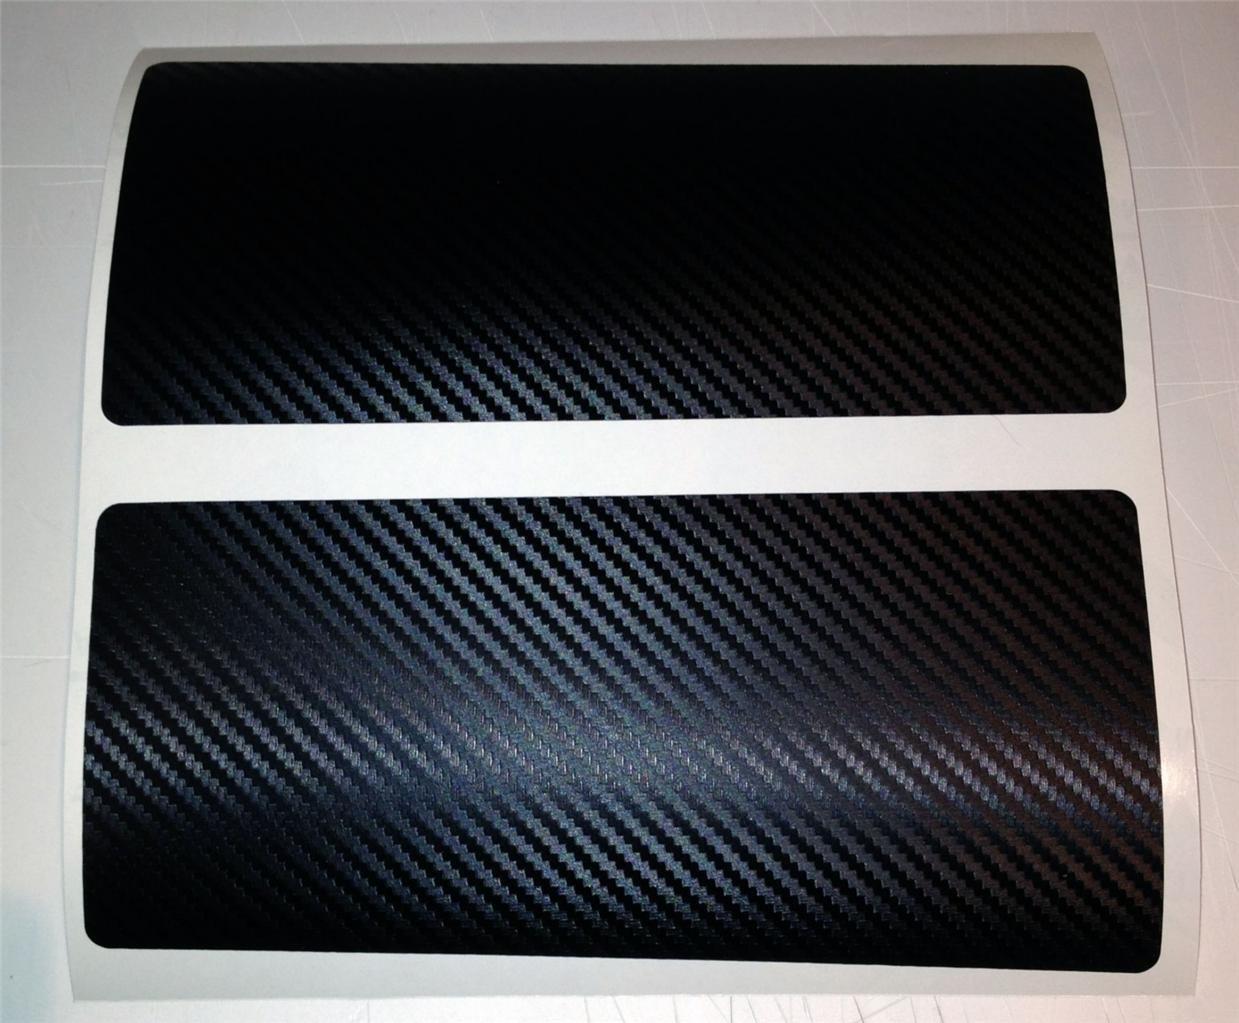 Protector de horquilla hecho de fibra de carbono Ellis Graphix para para Bicicleta MTB y BMX